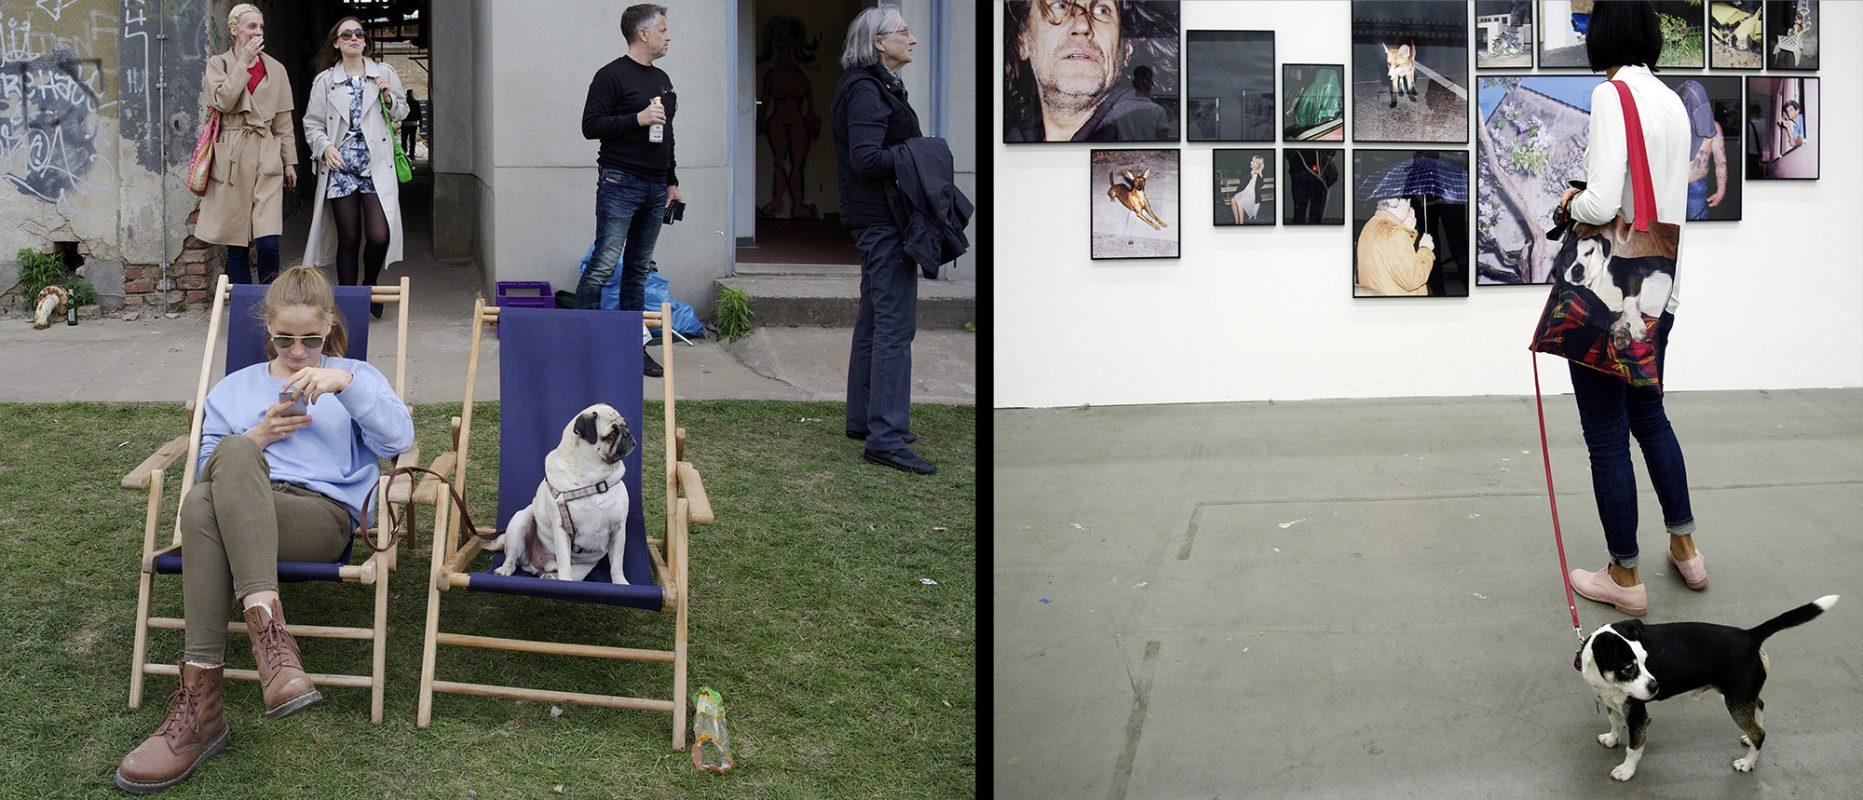 Atelierareal Lehderstraße, Jonas Burger, Besucher, Mops, Ausstellung